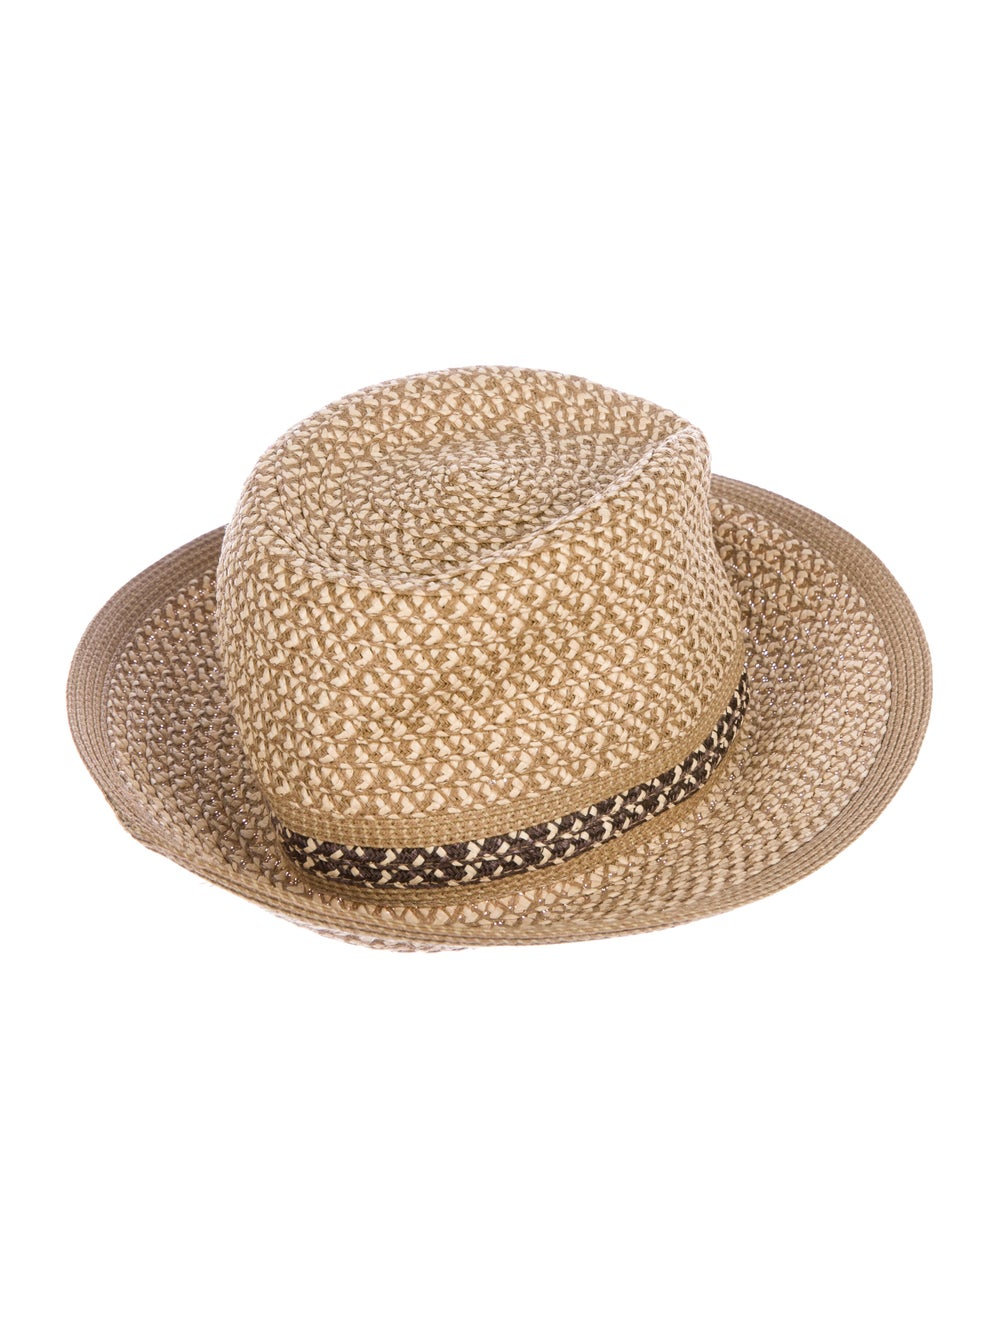 Eric Javits Woven Straw Hat Tan - image 2